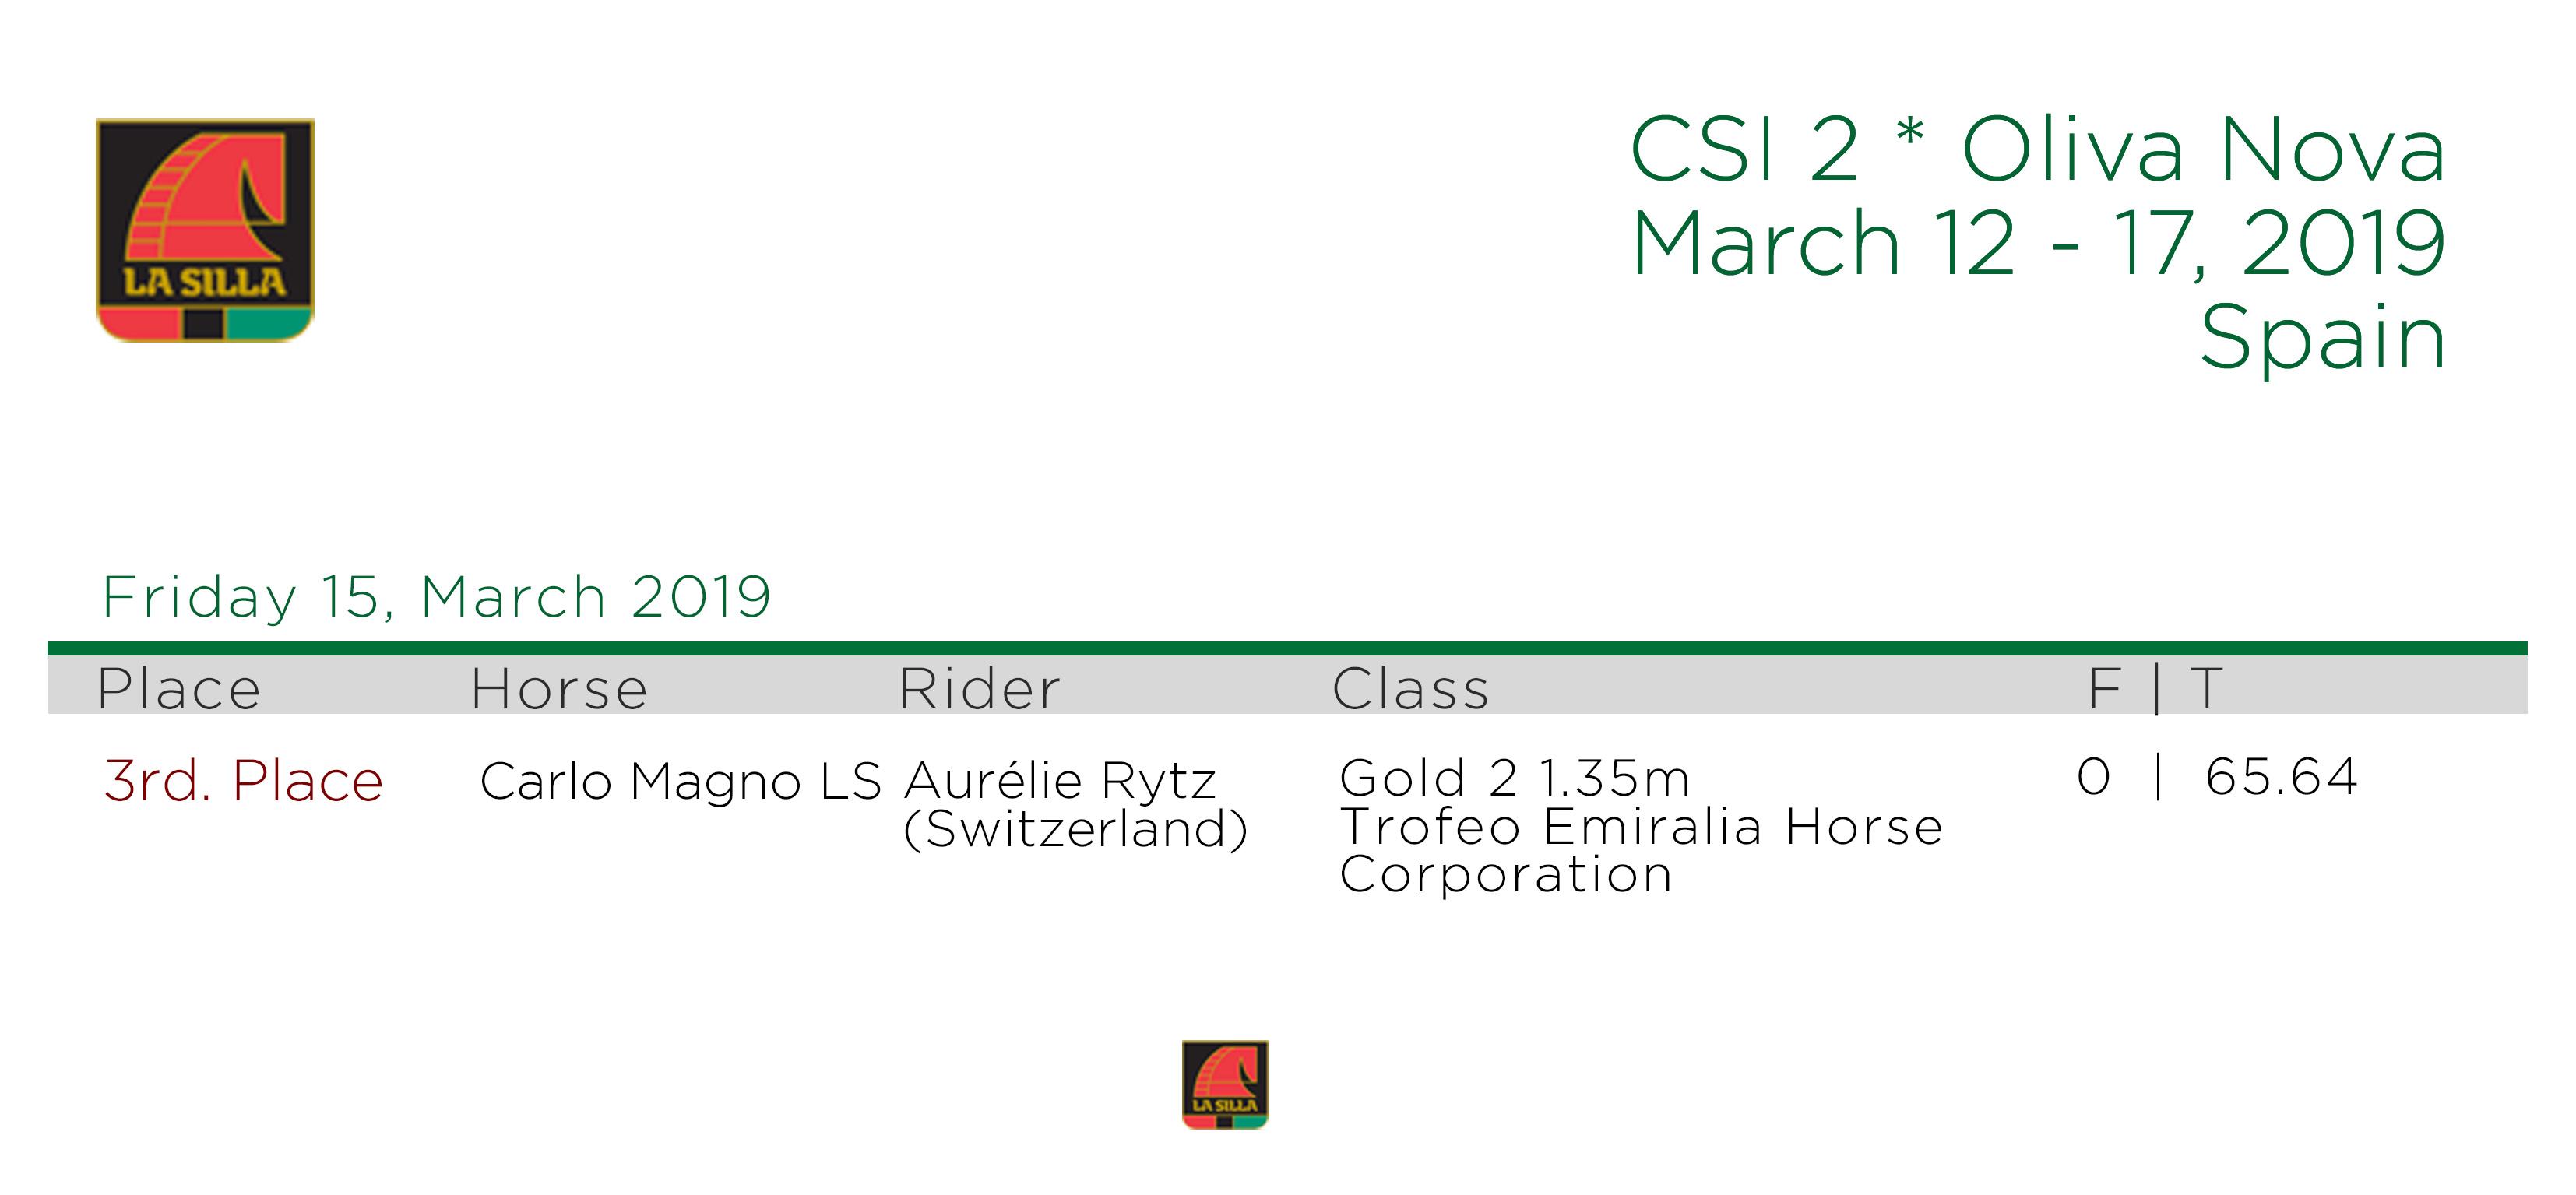 CSI-2--Oliva-Nova-March-12-17_2019-España